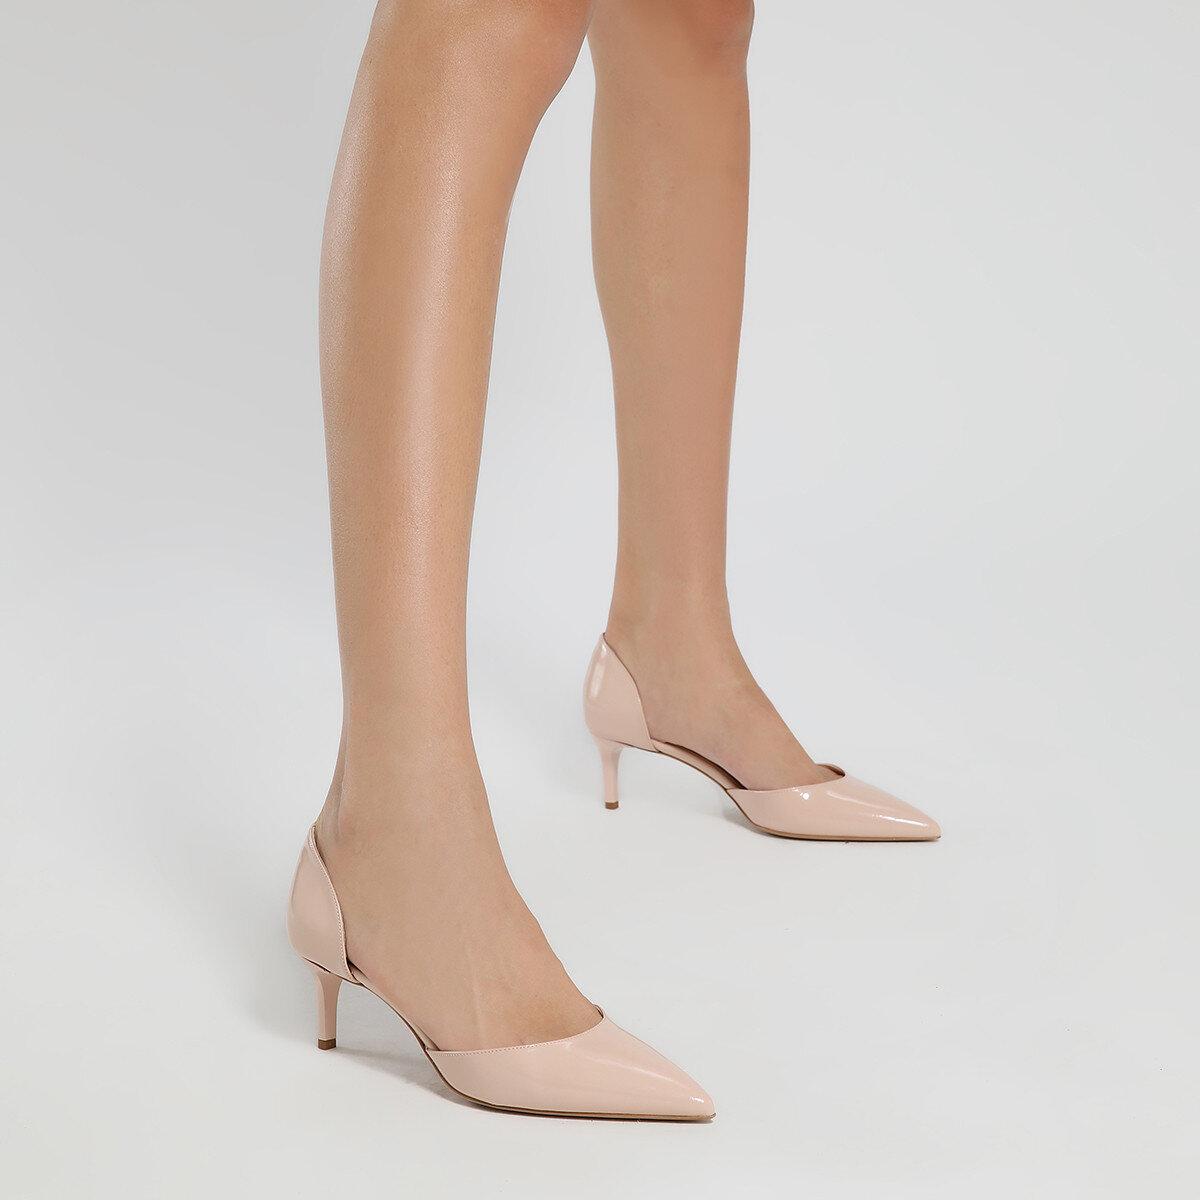 SOLA Pudra Kadın Stiletto